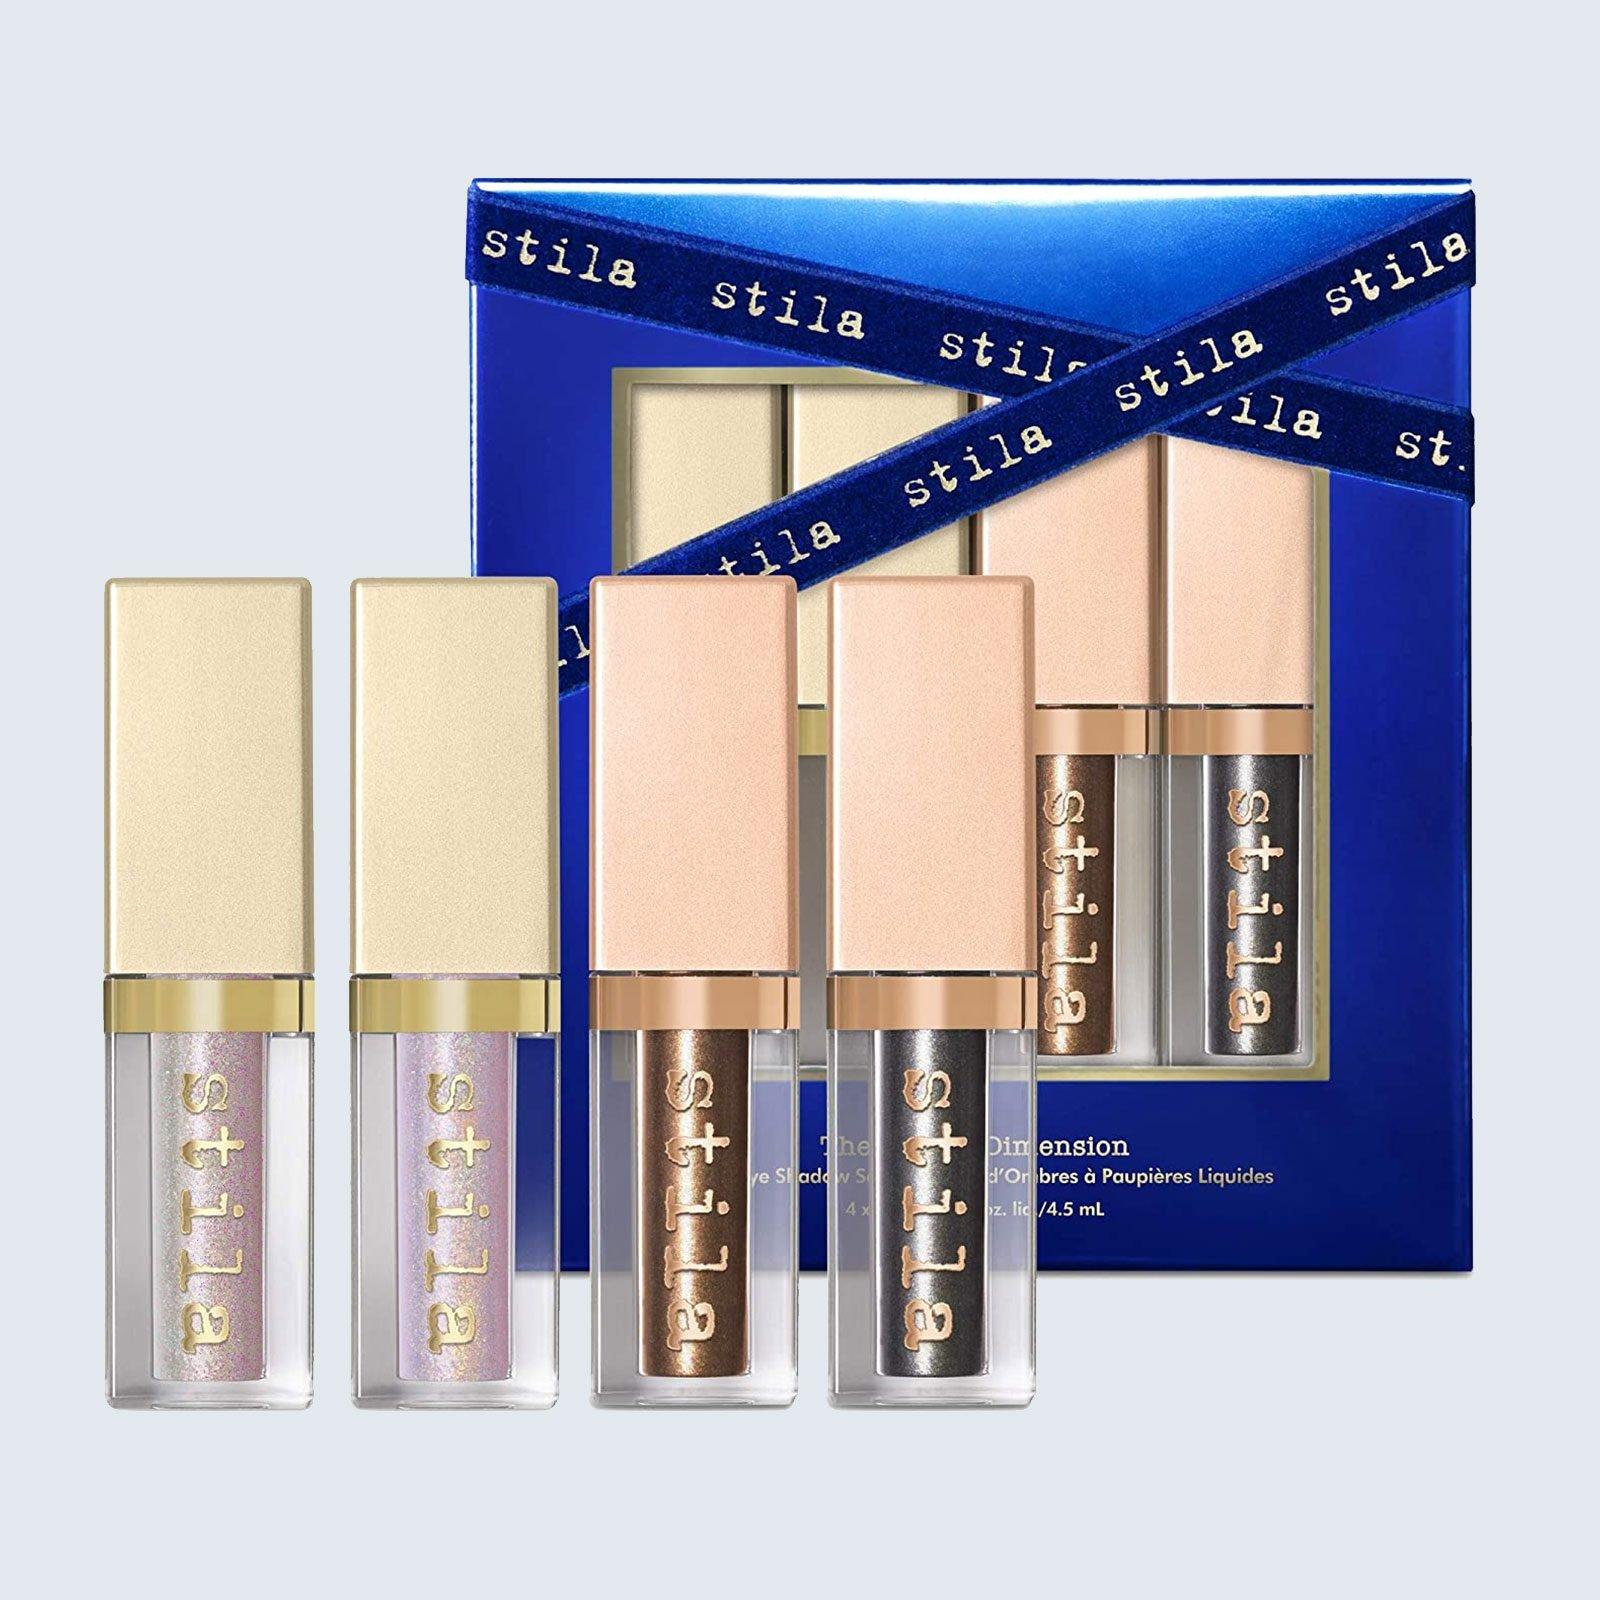 For the makeup maven: Stila The Fourth Dimension Liquid Eye Shadow Set